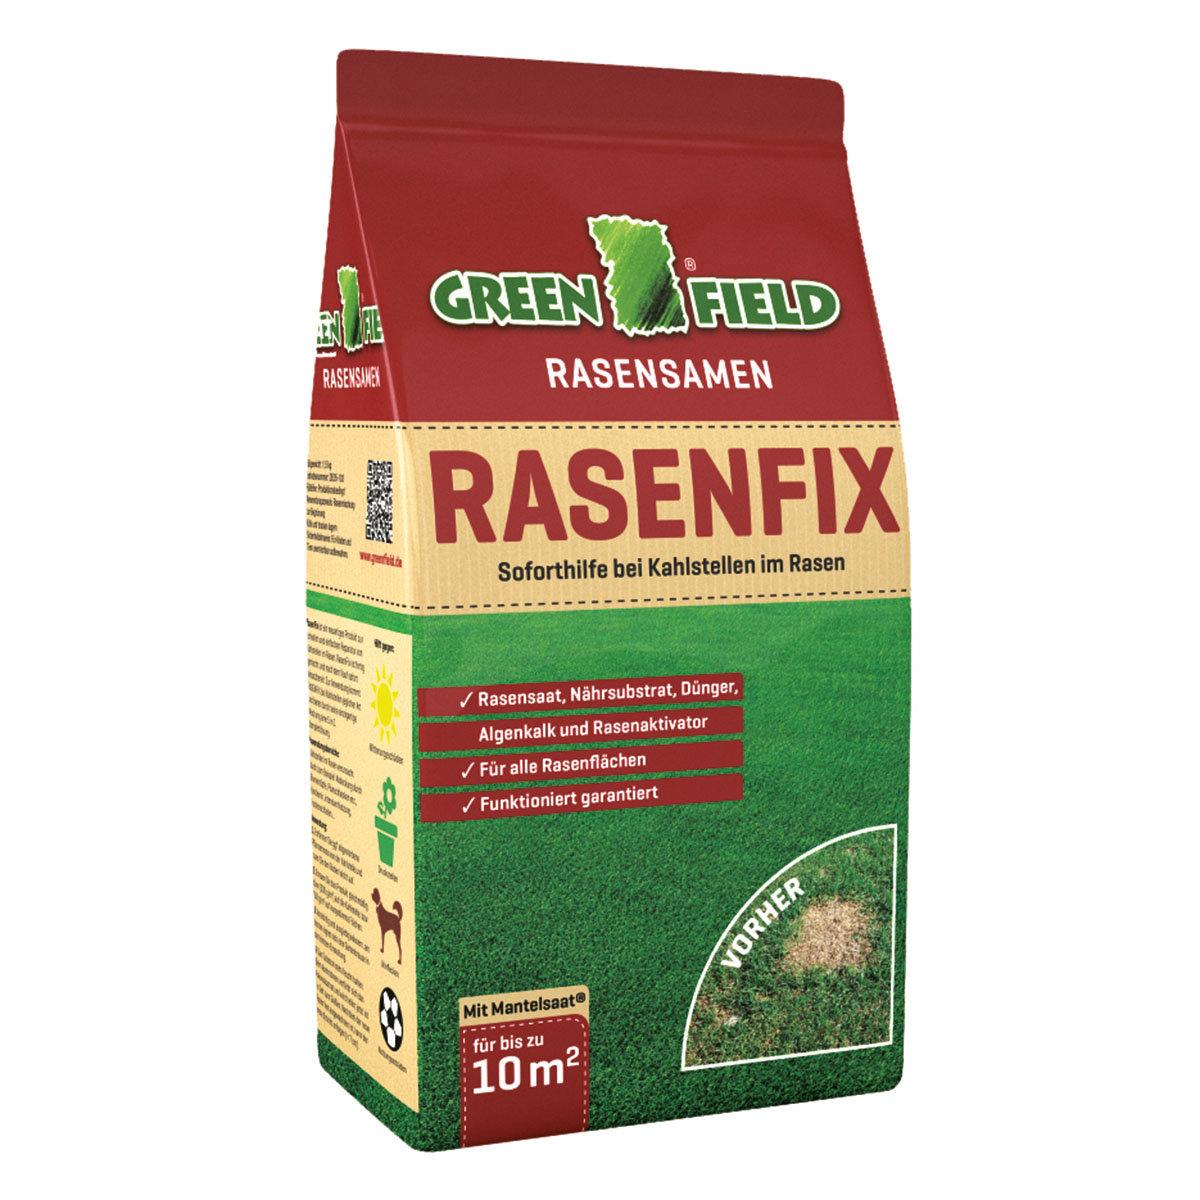 RasenFixsamen, 1,5 kg